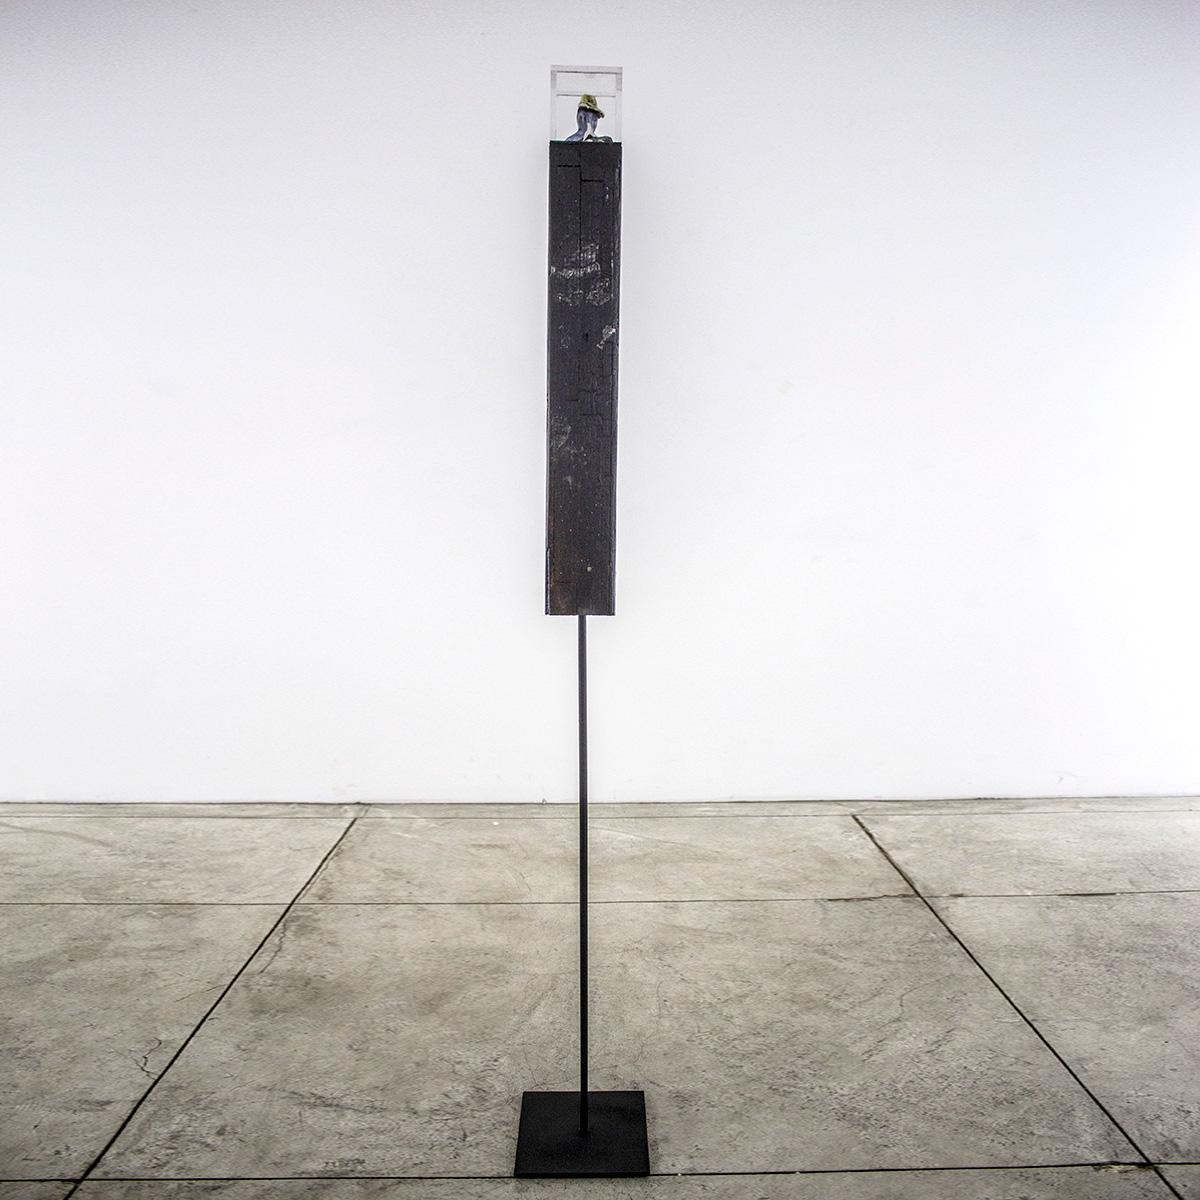 """Homenaje"" Charles Romuald Gardes 1890-1935 - Metal base, burned wood, Carlos Gardel mini broken sculpture acrylic box - 3-1/2""x3-1/2""x58"" - © Flavio Bisciotti"